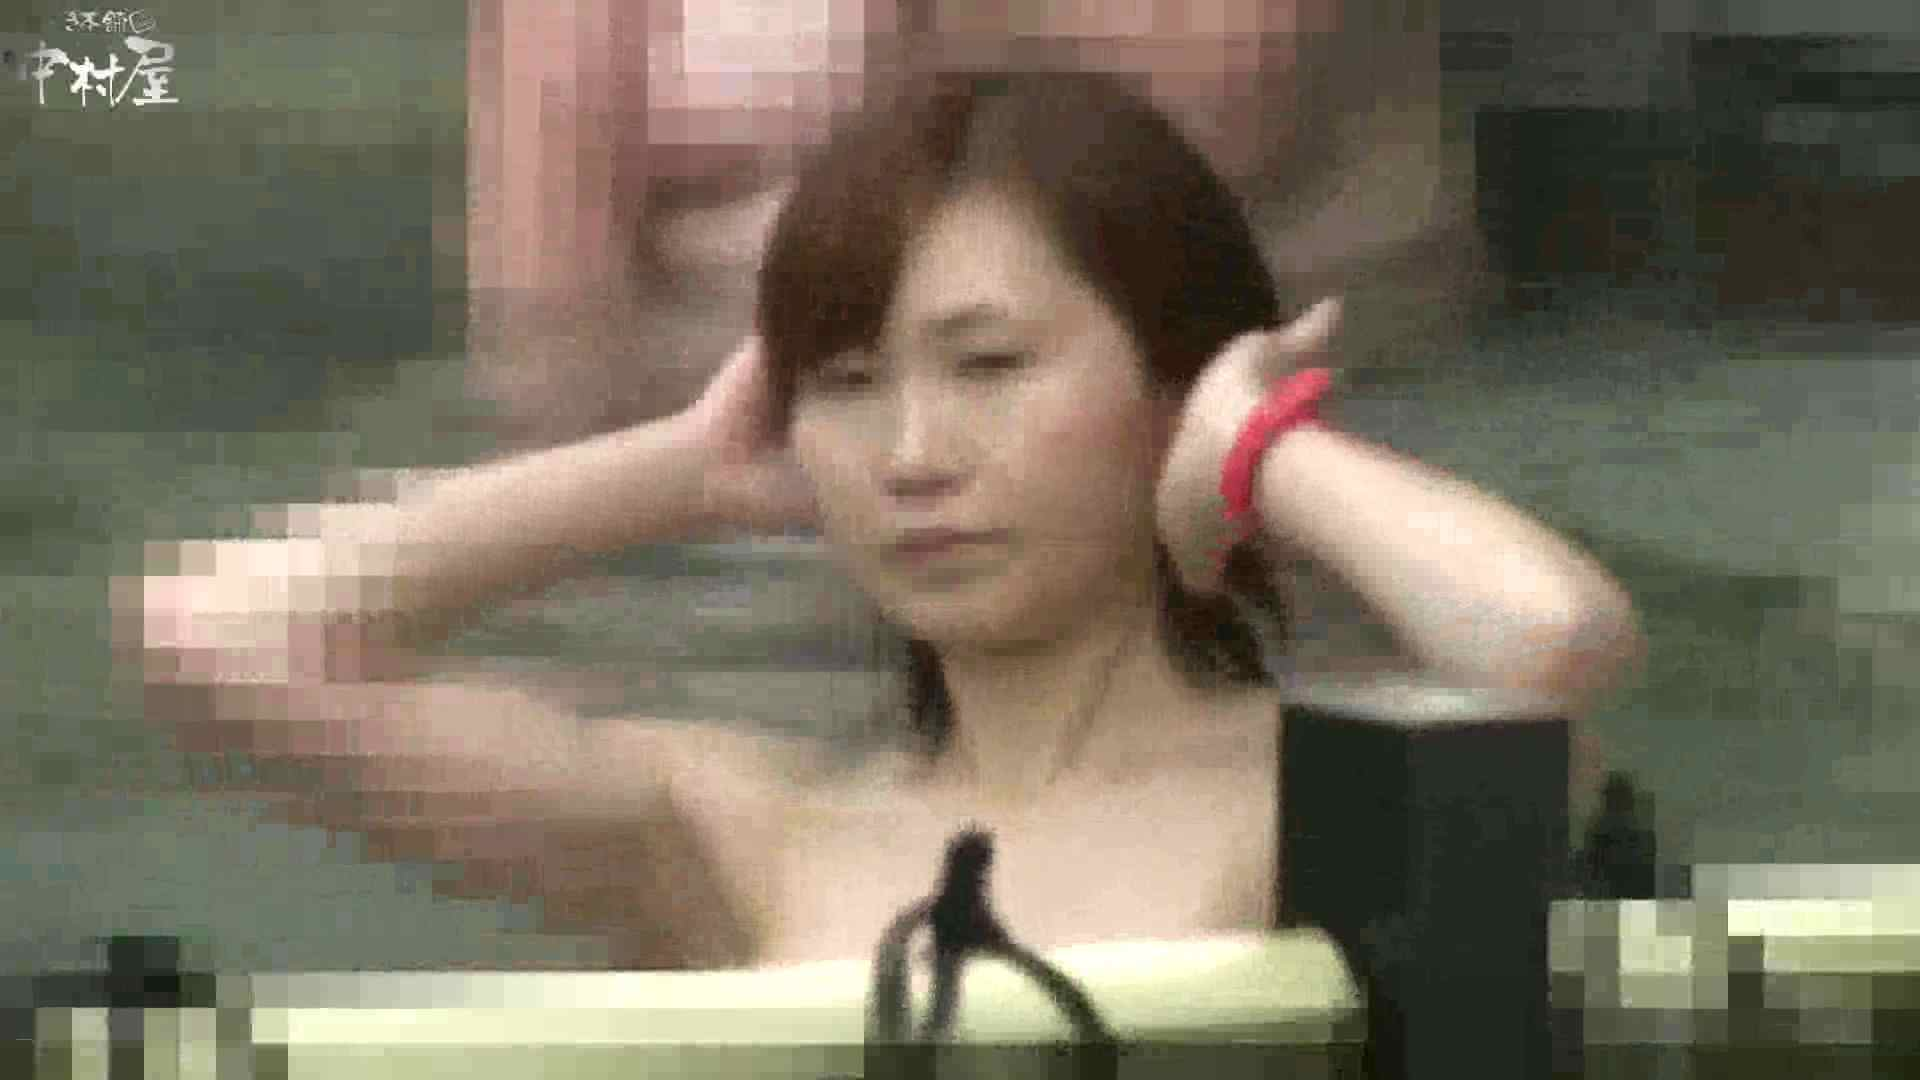 Aquaな露天風呂Vol.877潜入盗撮露天風呂十三判湯 其の二 潜入突撃  97pic 44